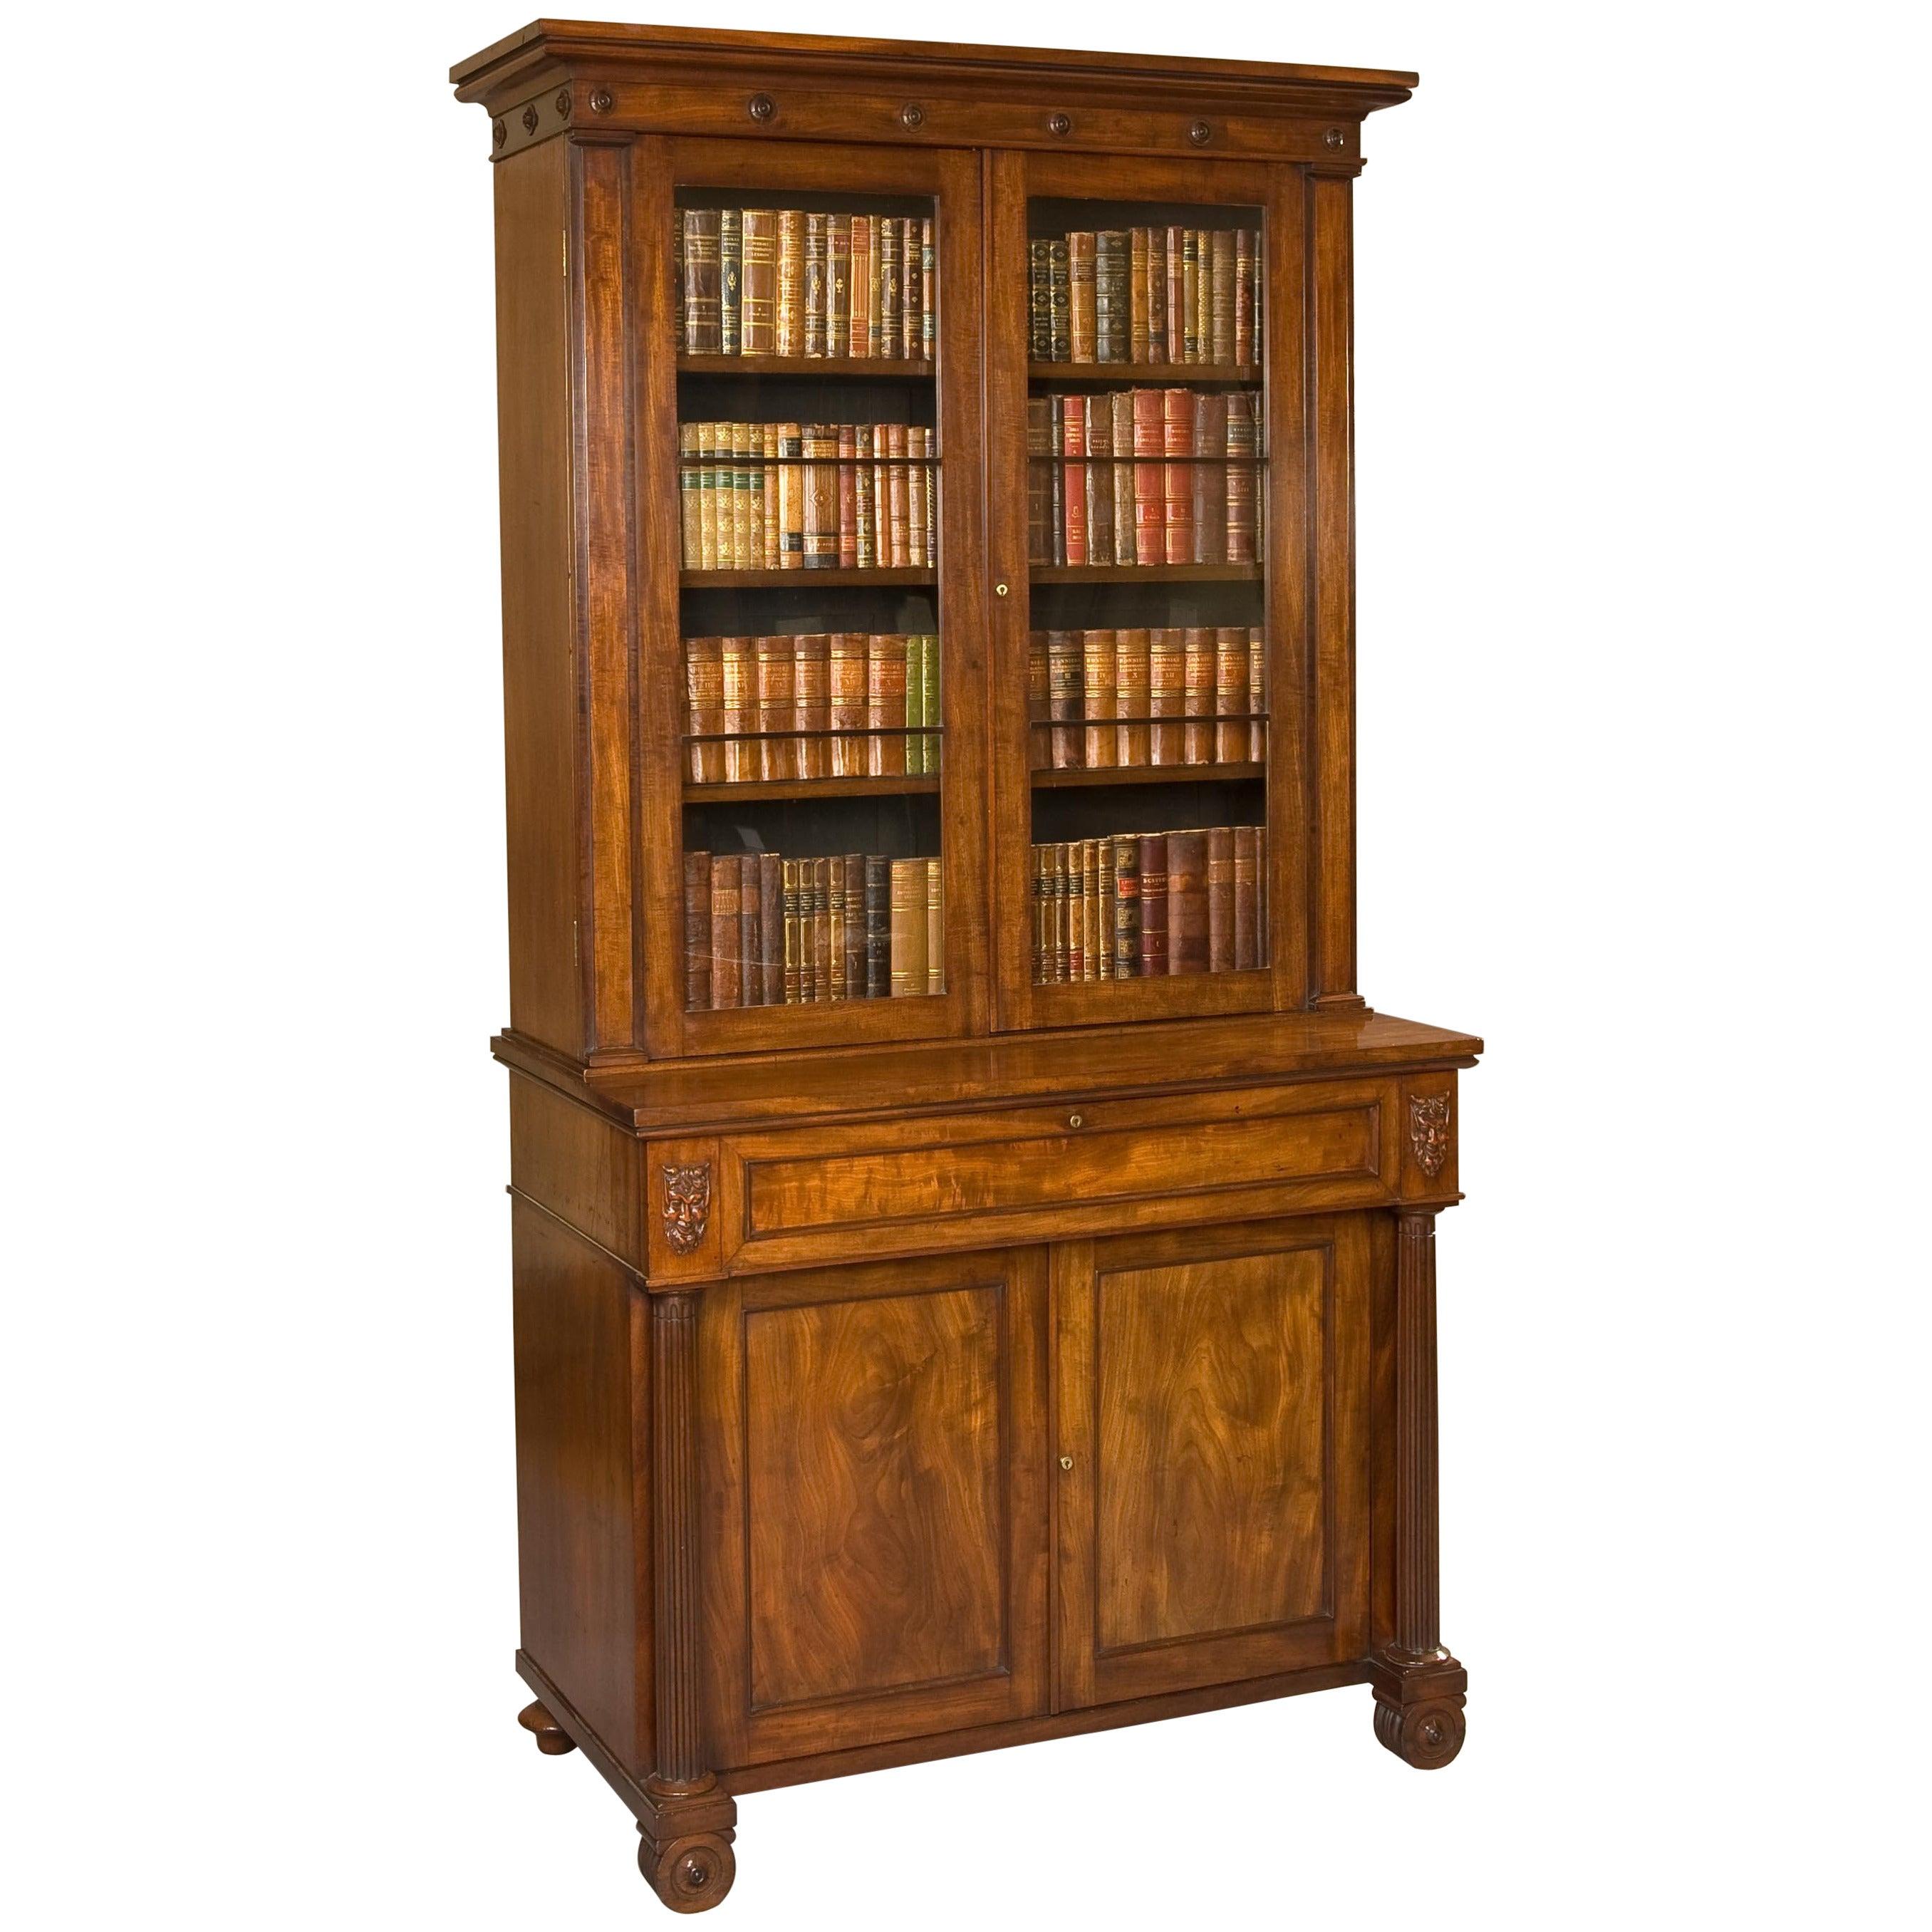 19th Century English Mahogany Writing Bookcase with Cabinet